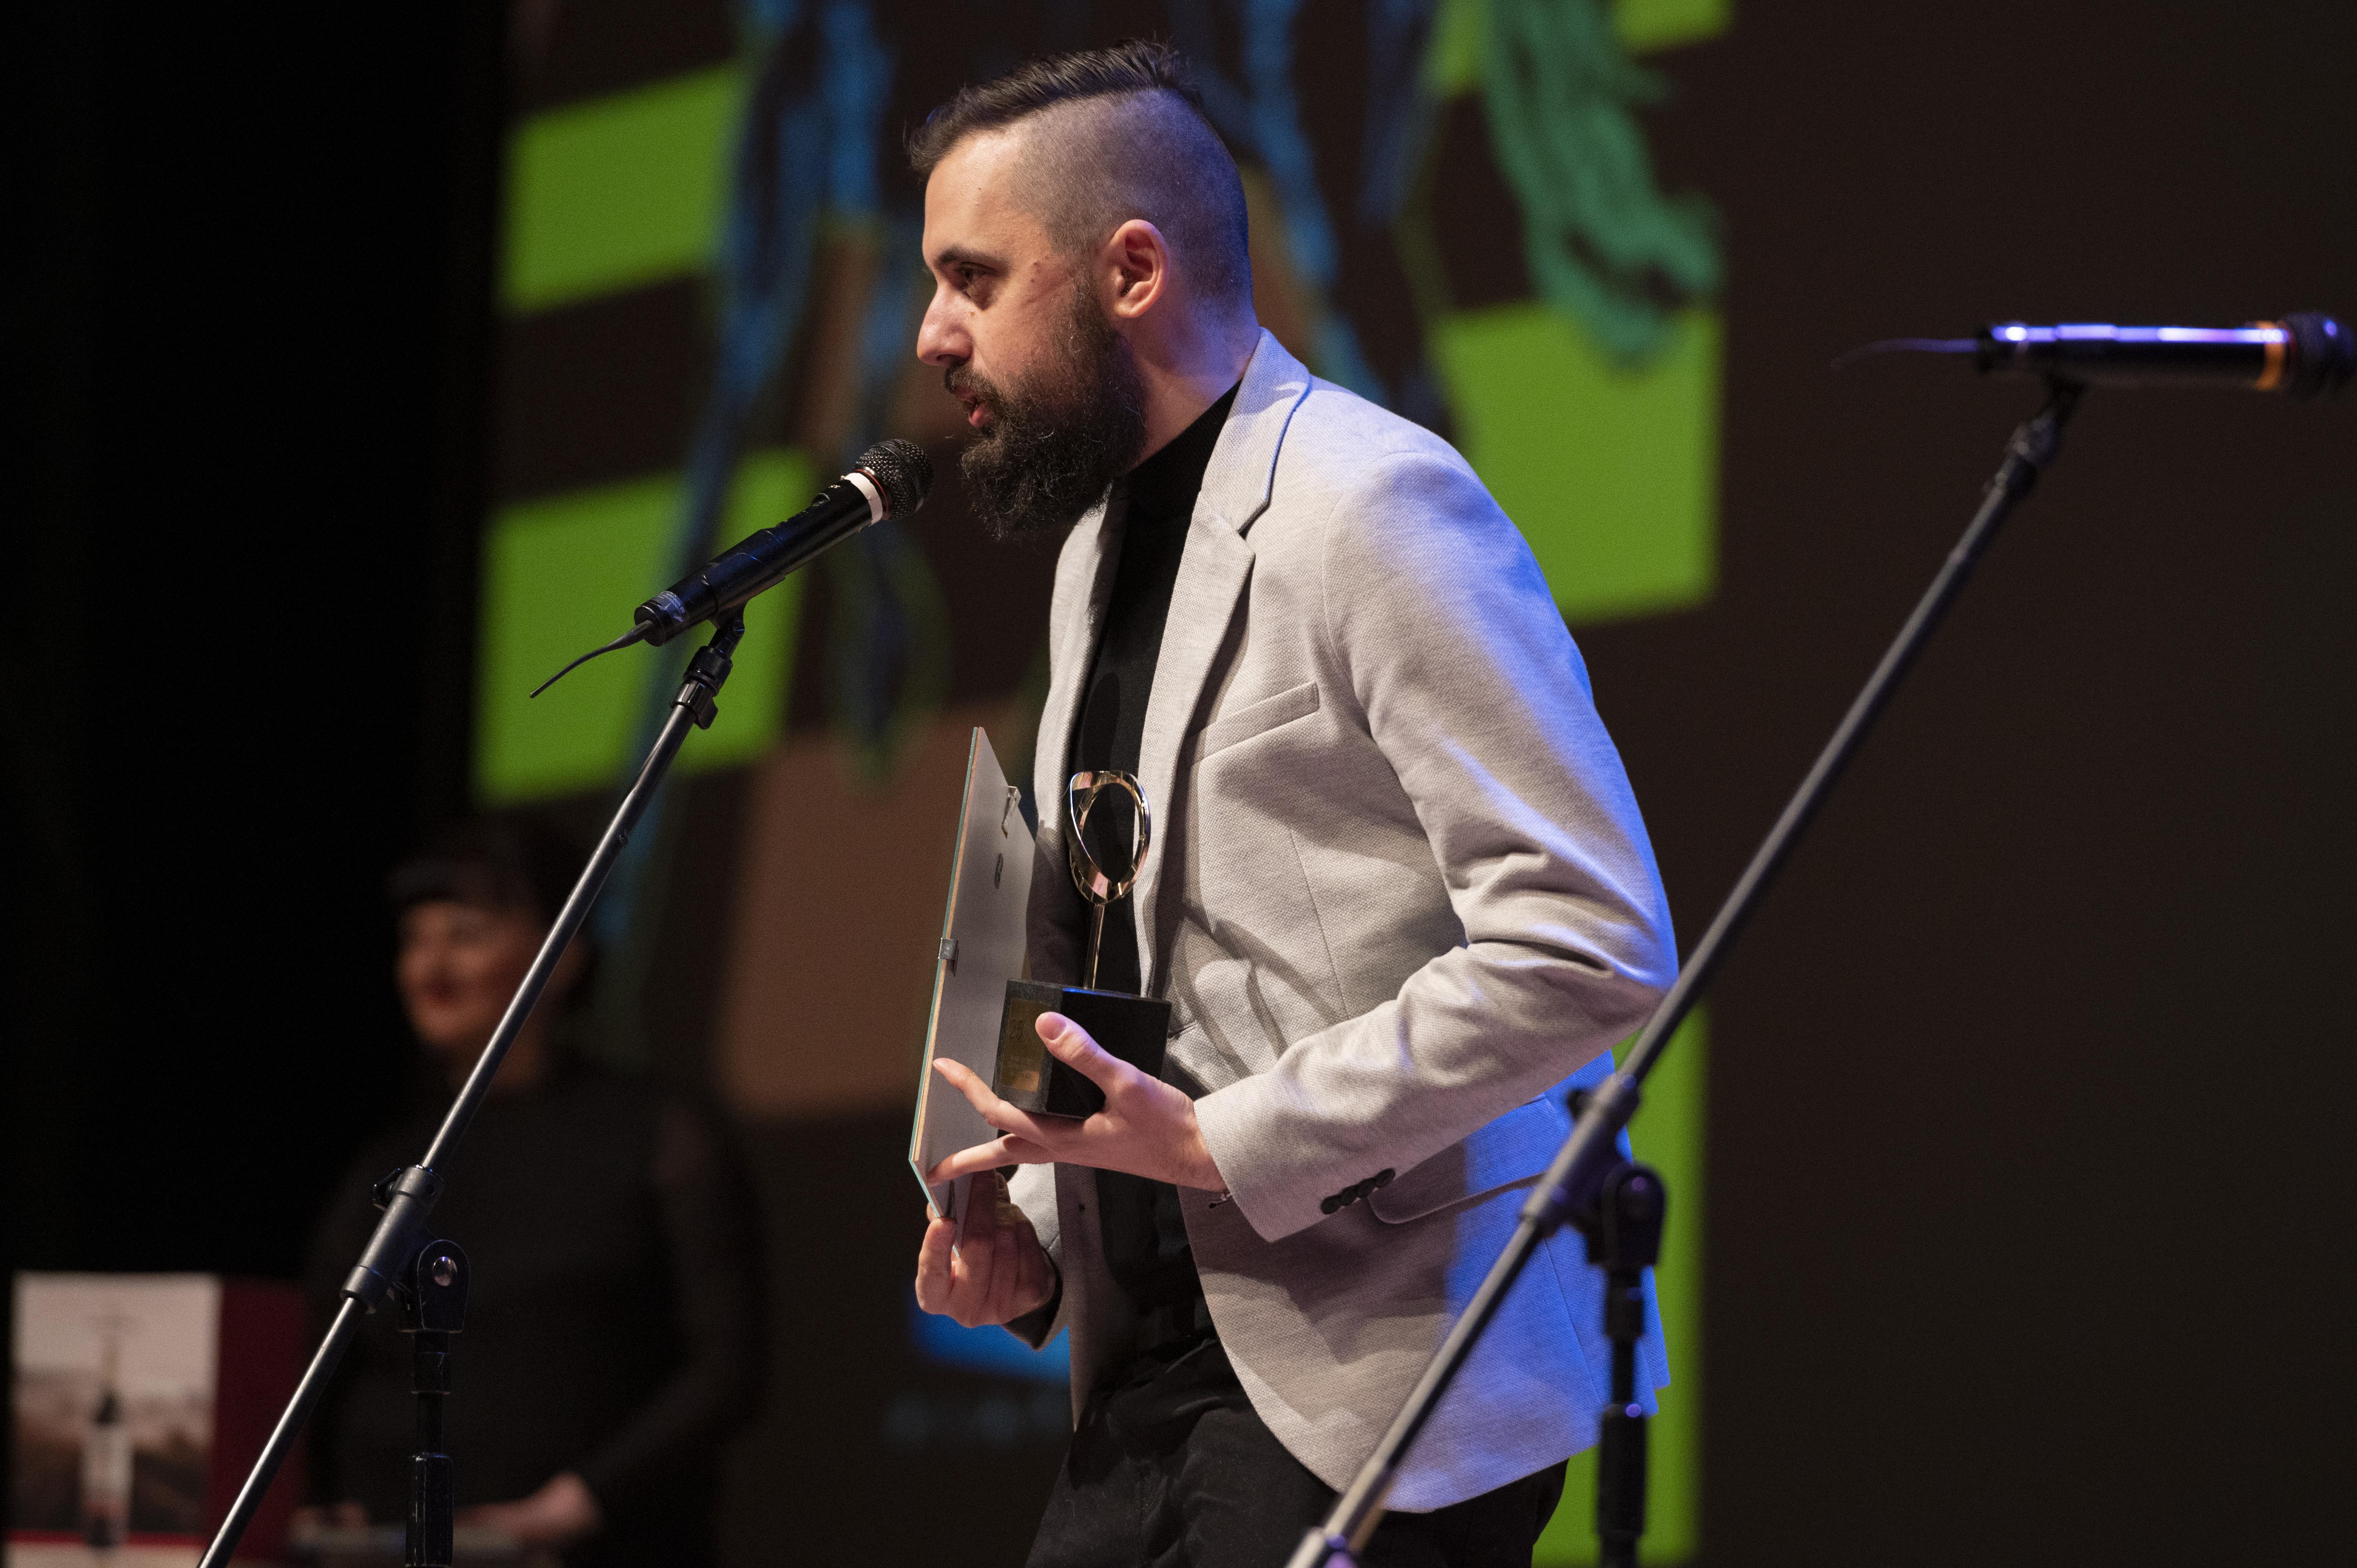 Pavel-G-Vesnakov_Special-Jury-Award.jpg